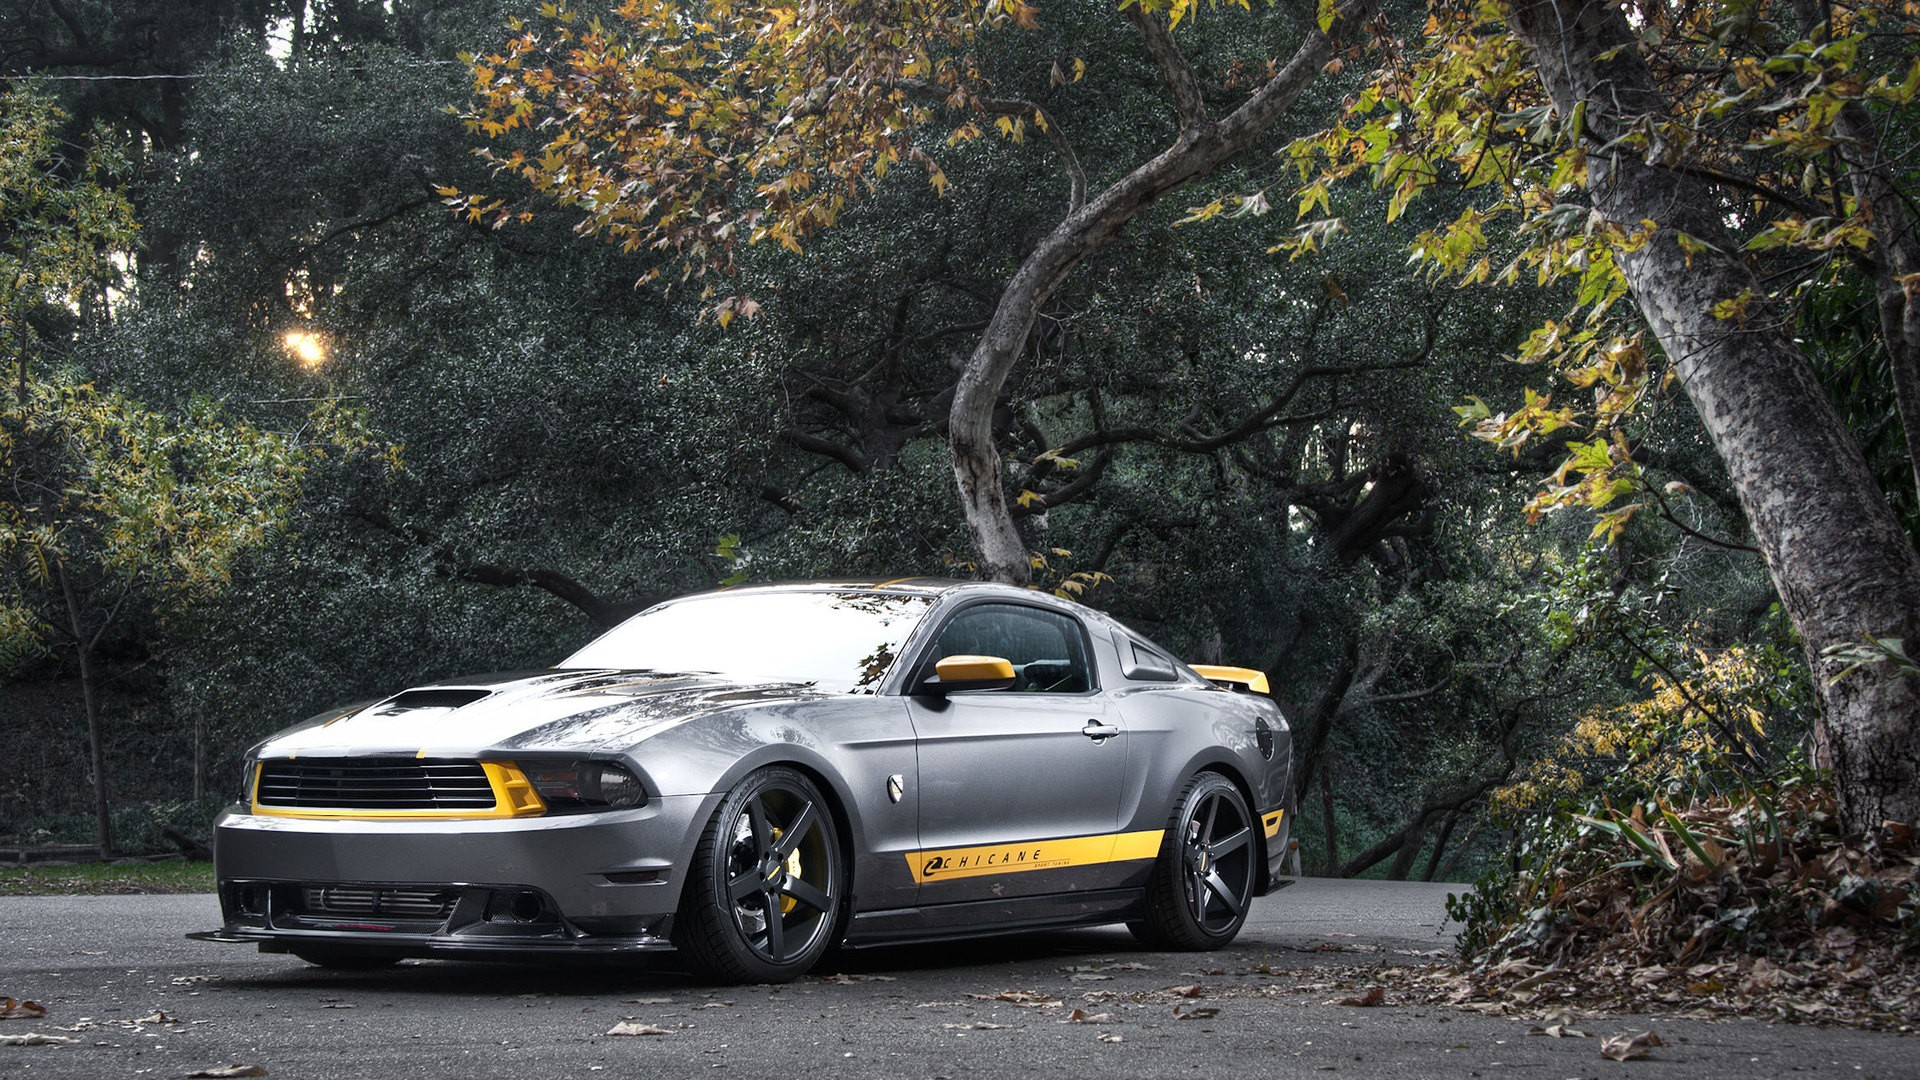 Wallpaper Ford Mustang GT car